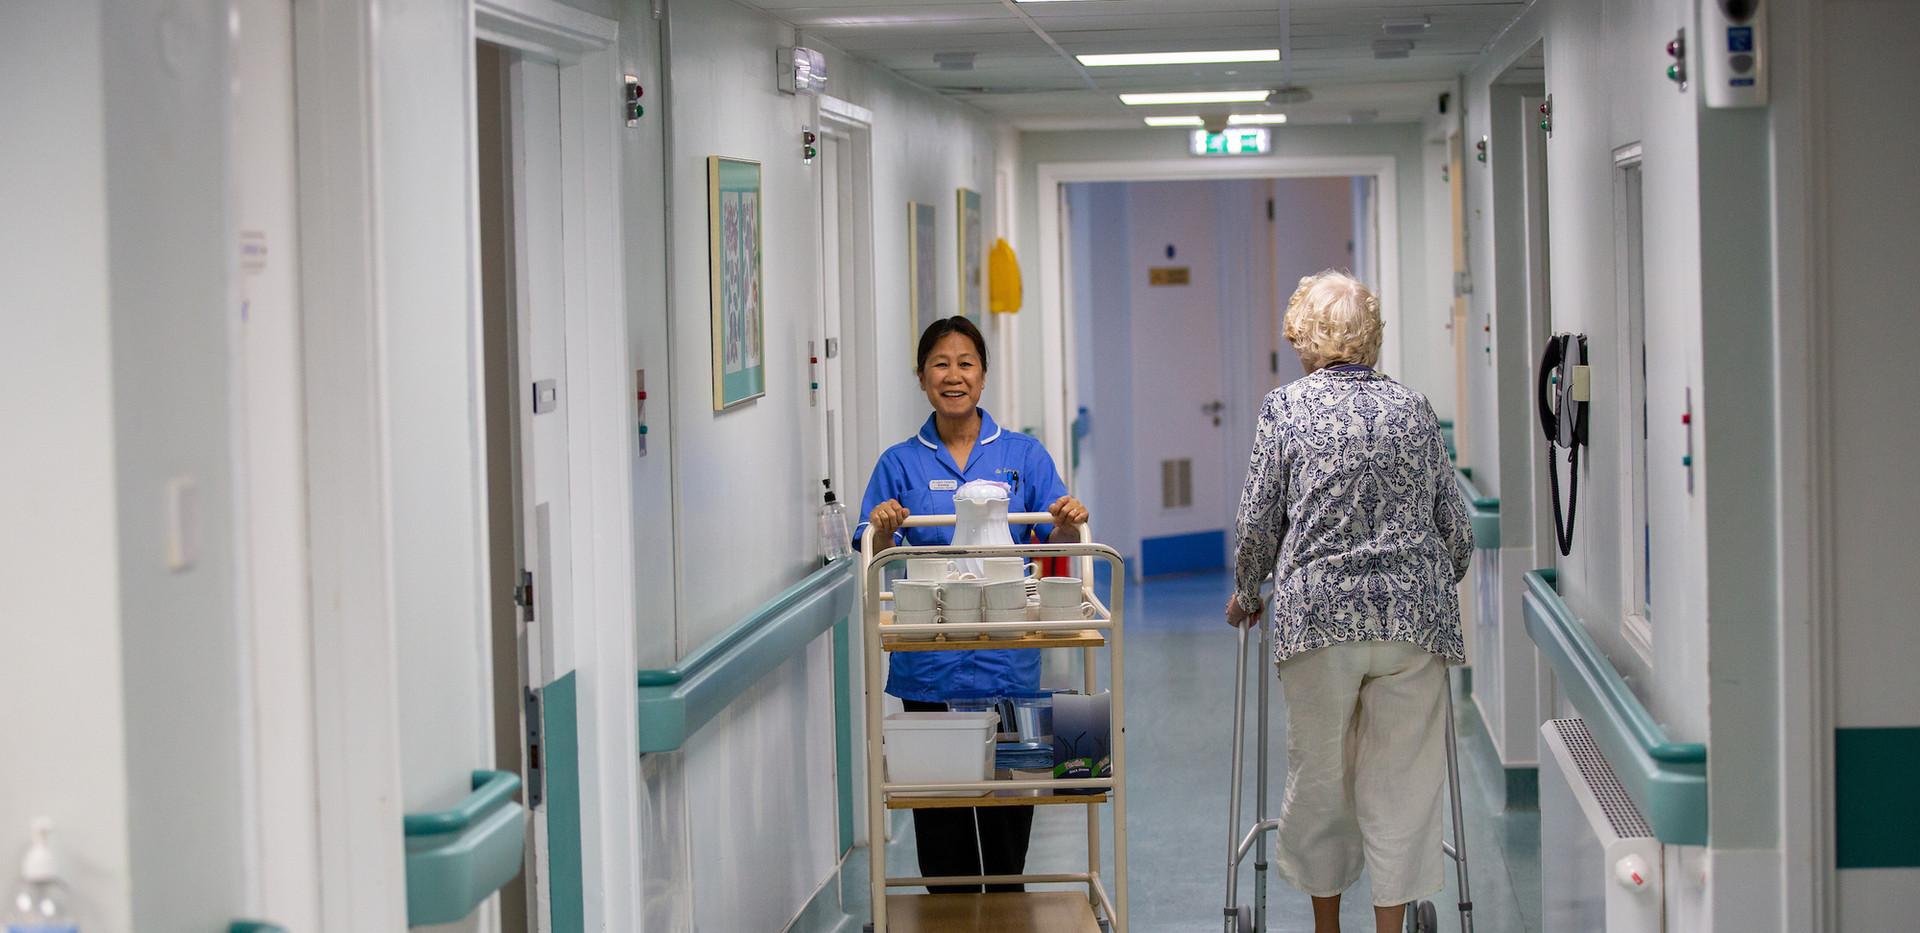 Hospital corridor and trolly photo.jpg